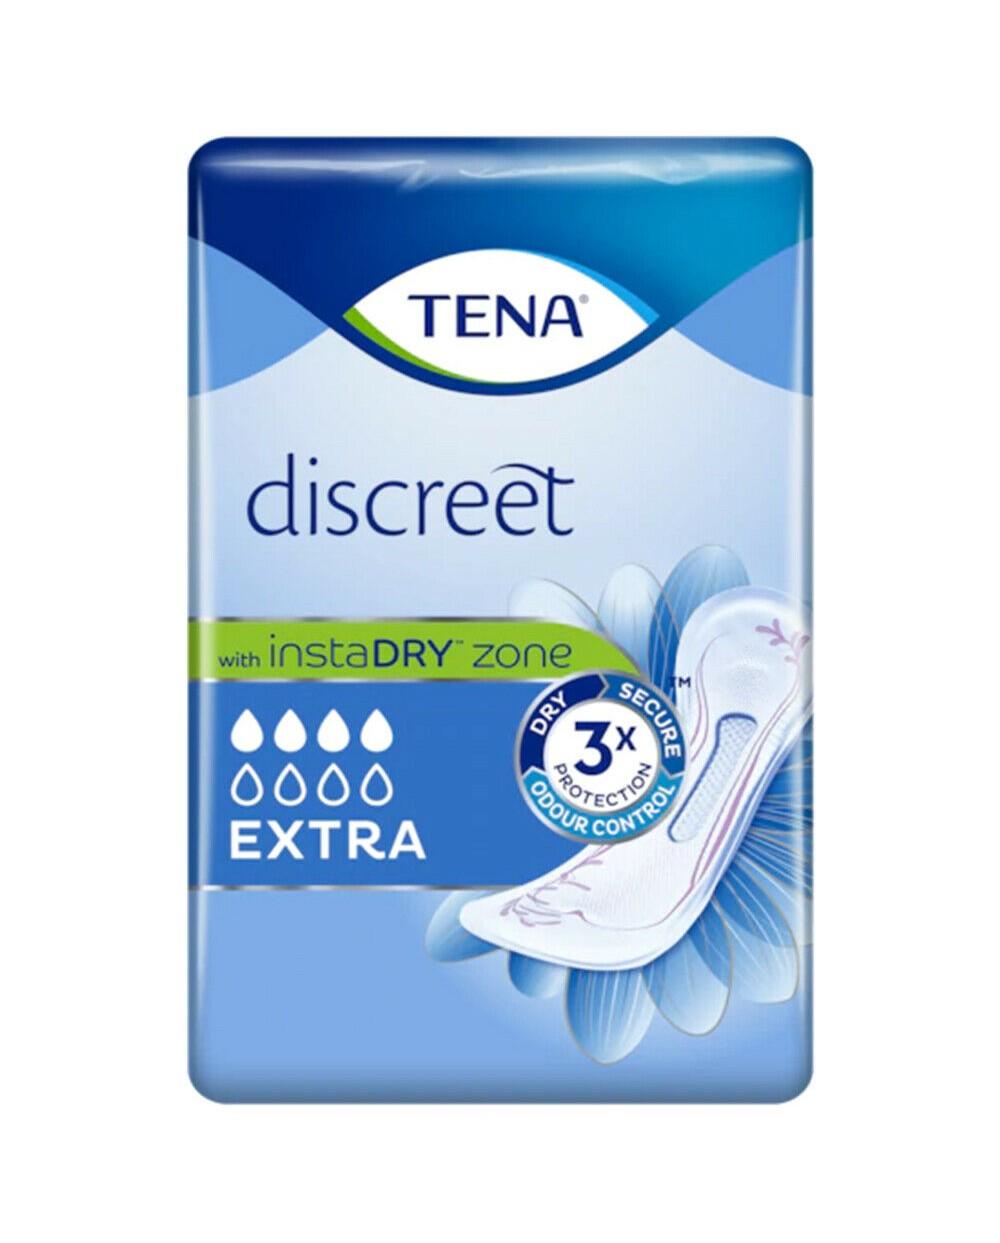 Tena Discreet Extra - 20 protections